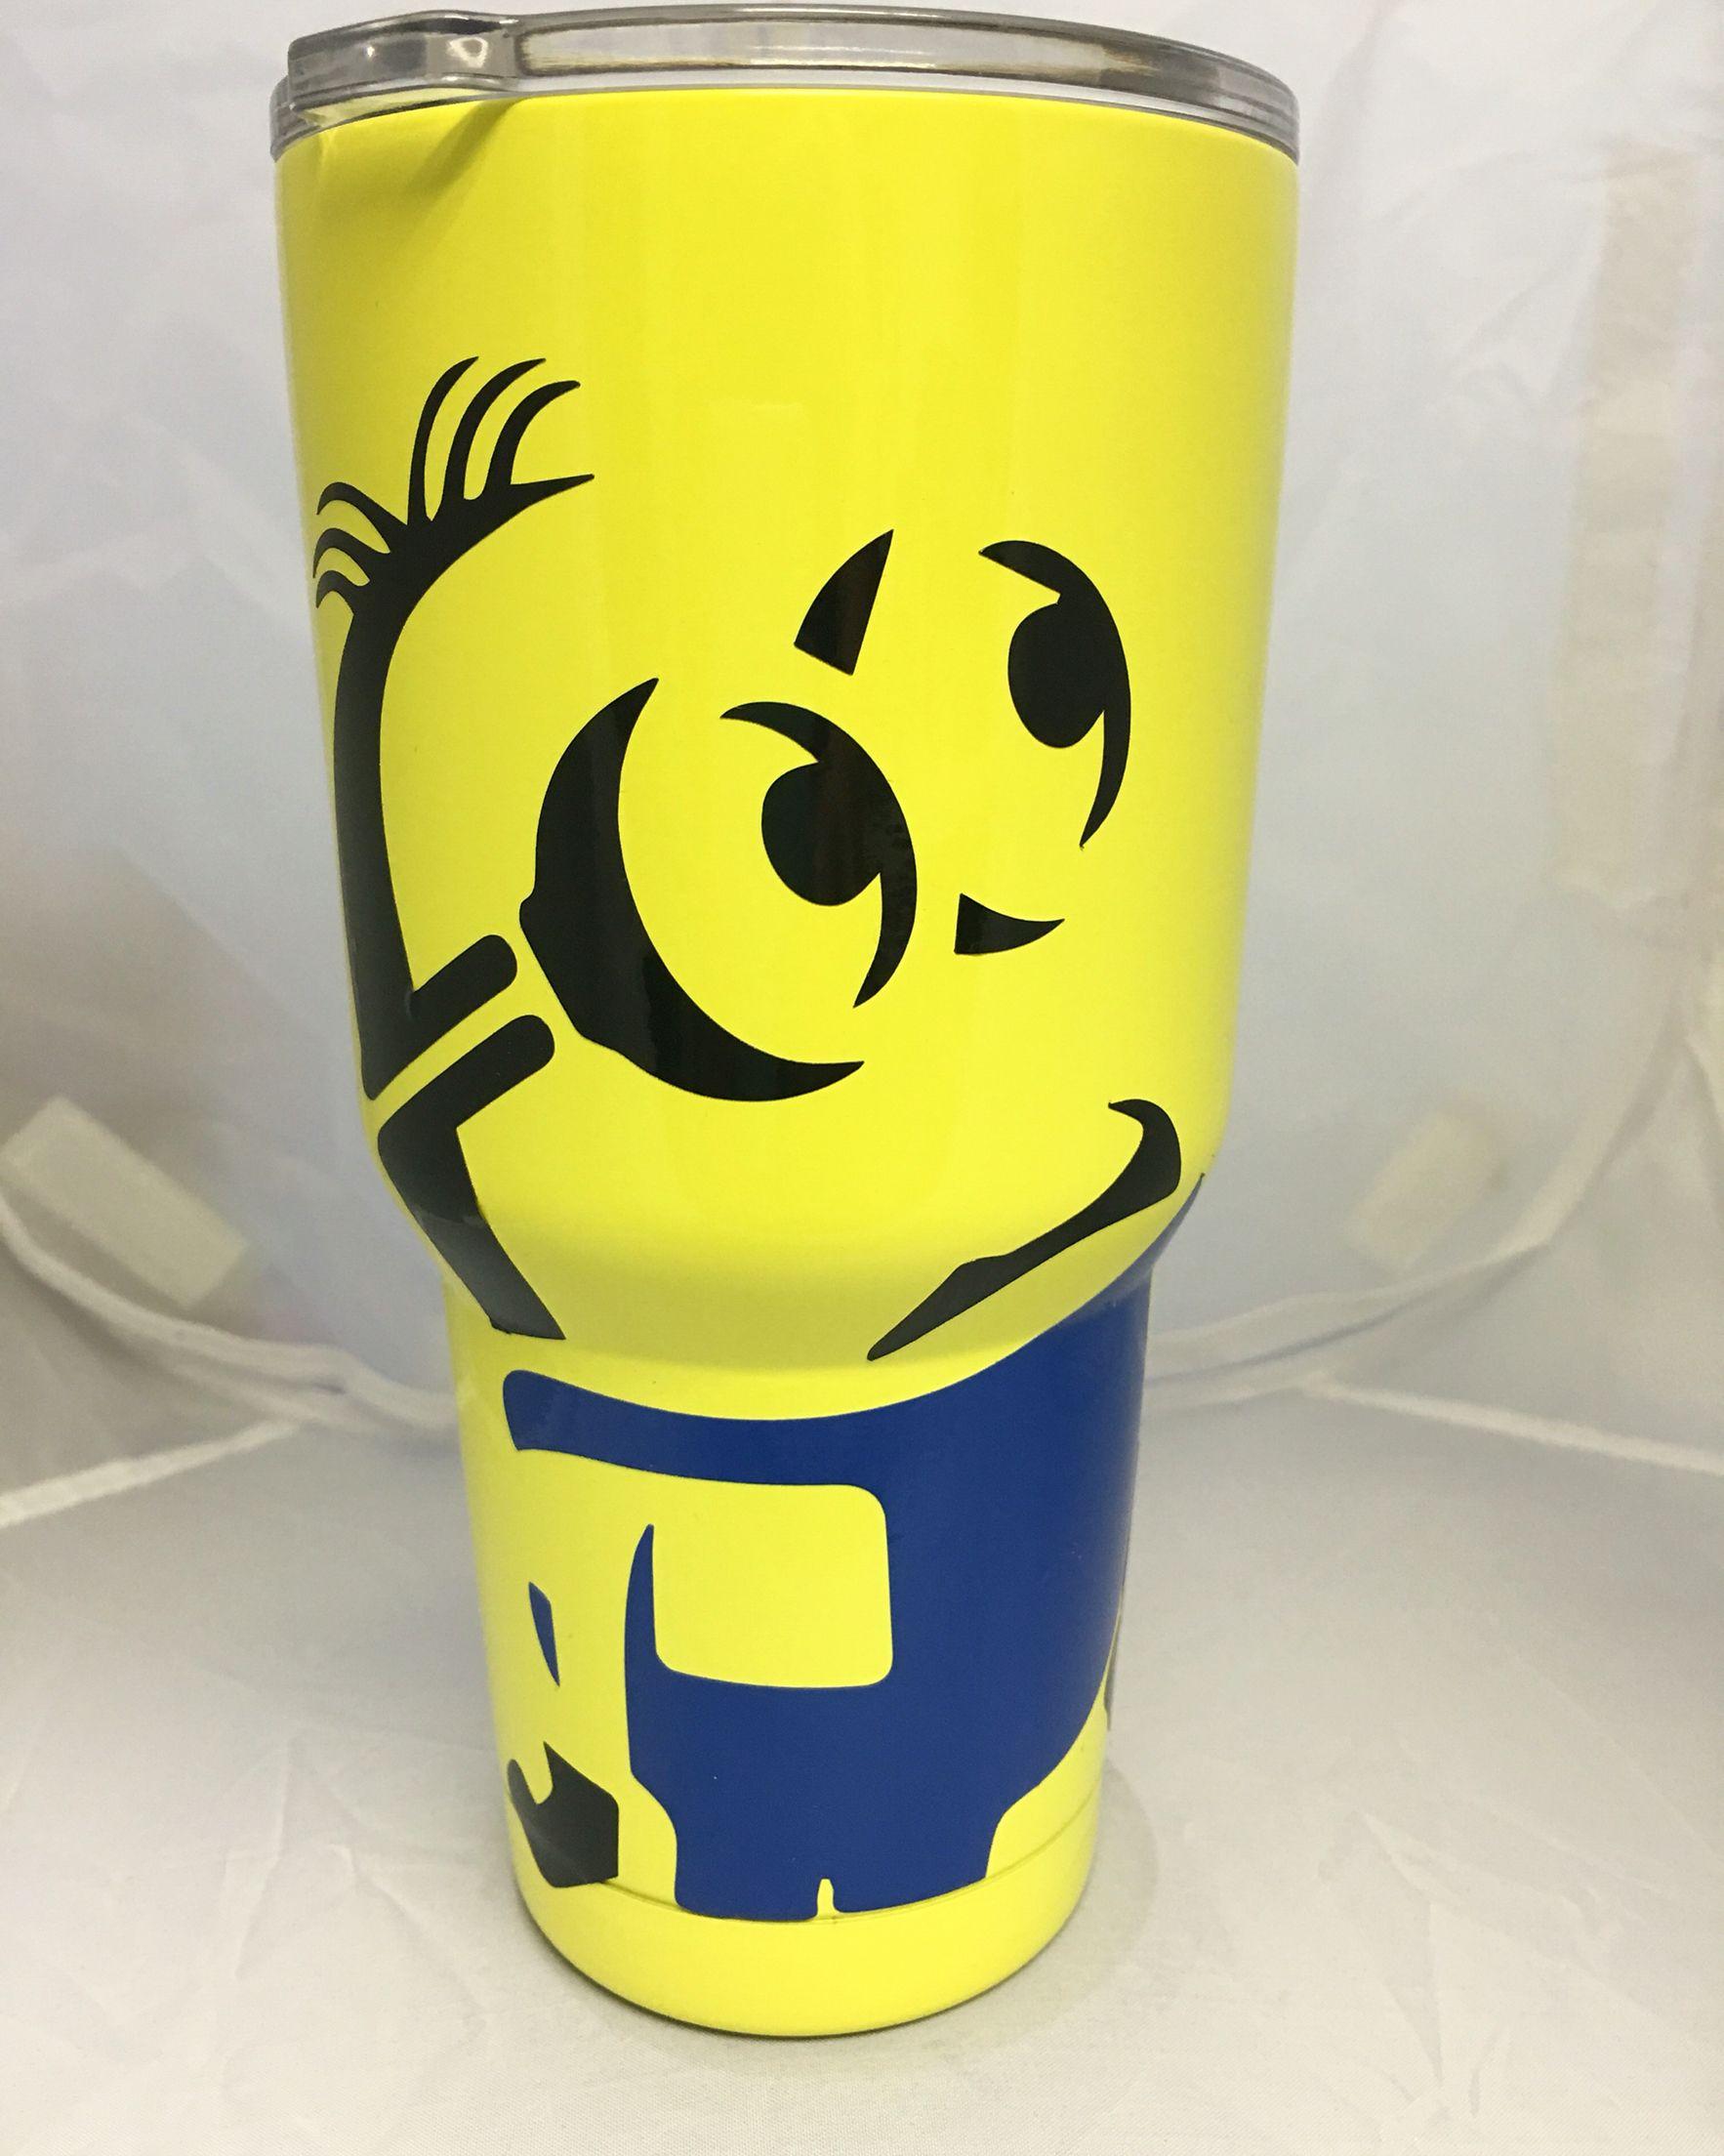 30oz Ozark Cup Powder Coated Yellow Vinyl Minion